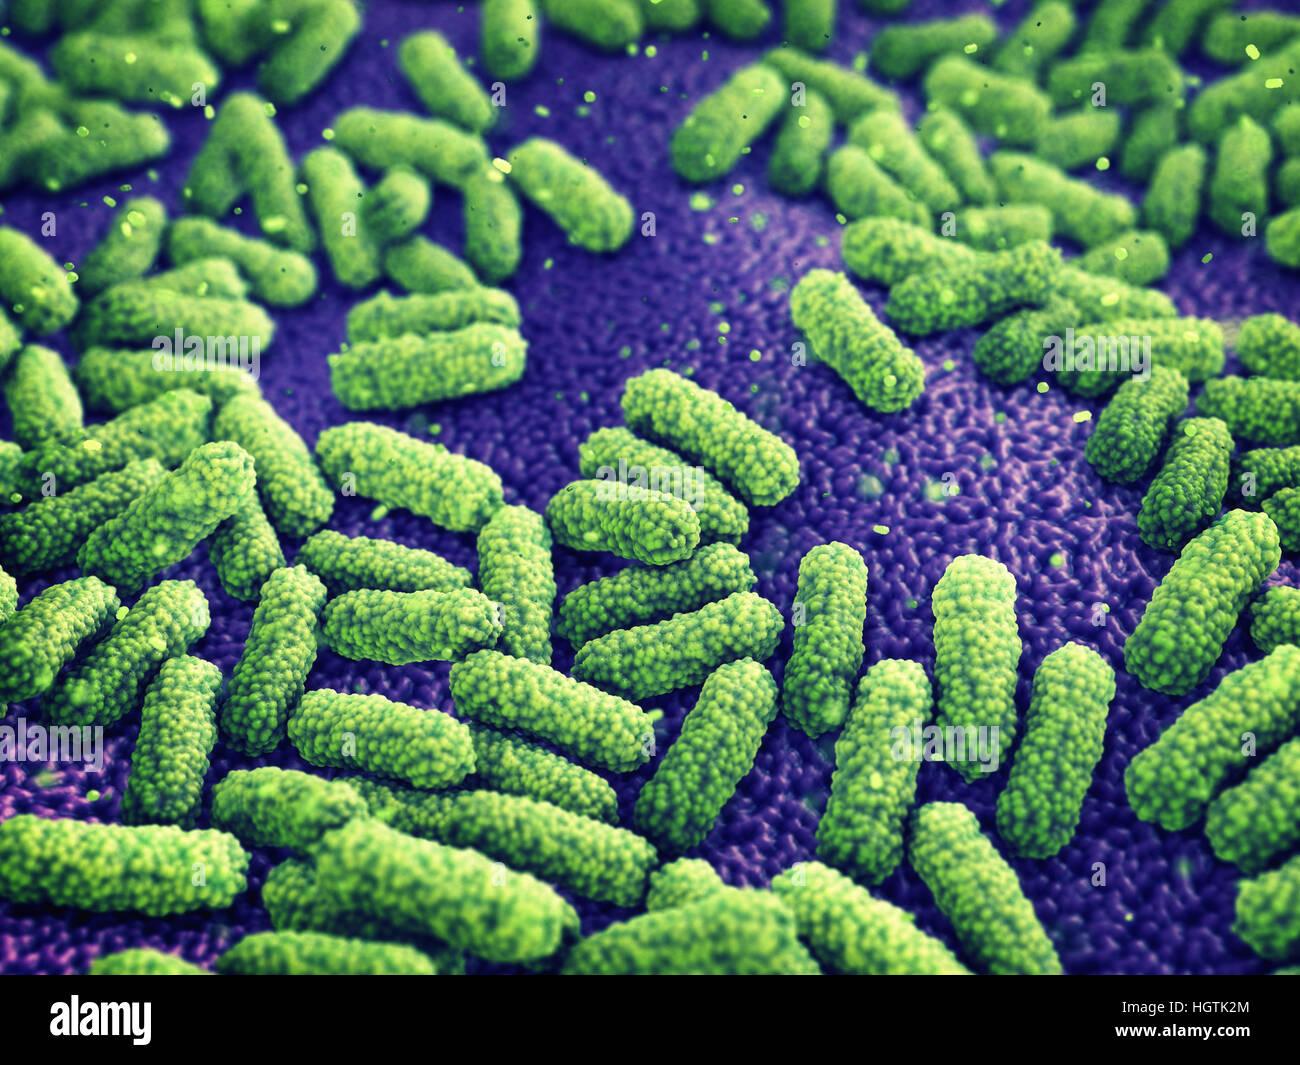 Bacteria , Germ infection , Epidemic disease - Stock Image